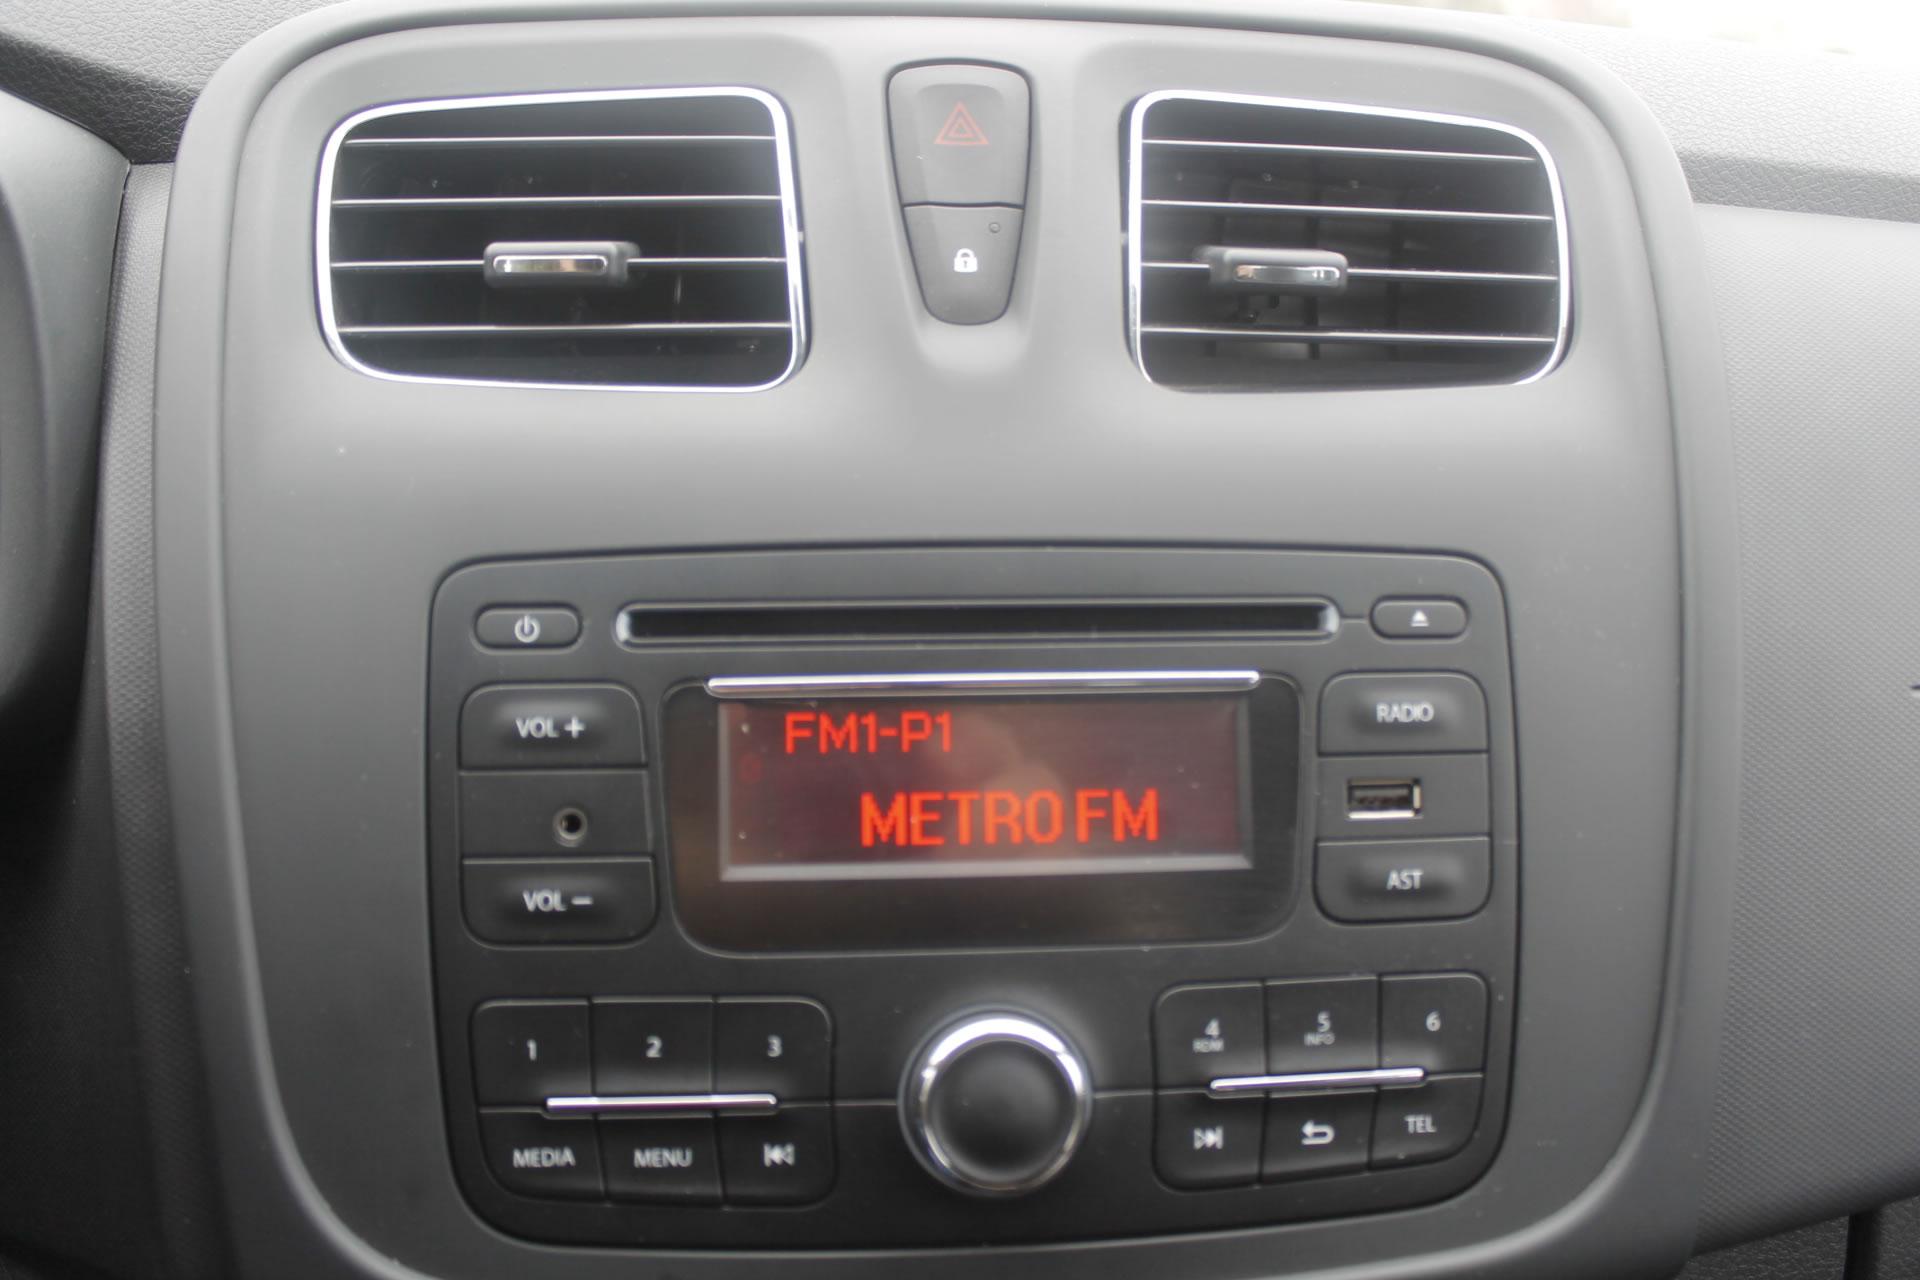 2015 Renault Symbol 1.5 dCi Joy 75 PS İncelemesi - Oto Kokpit